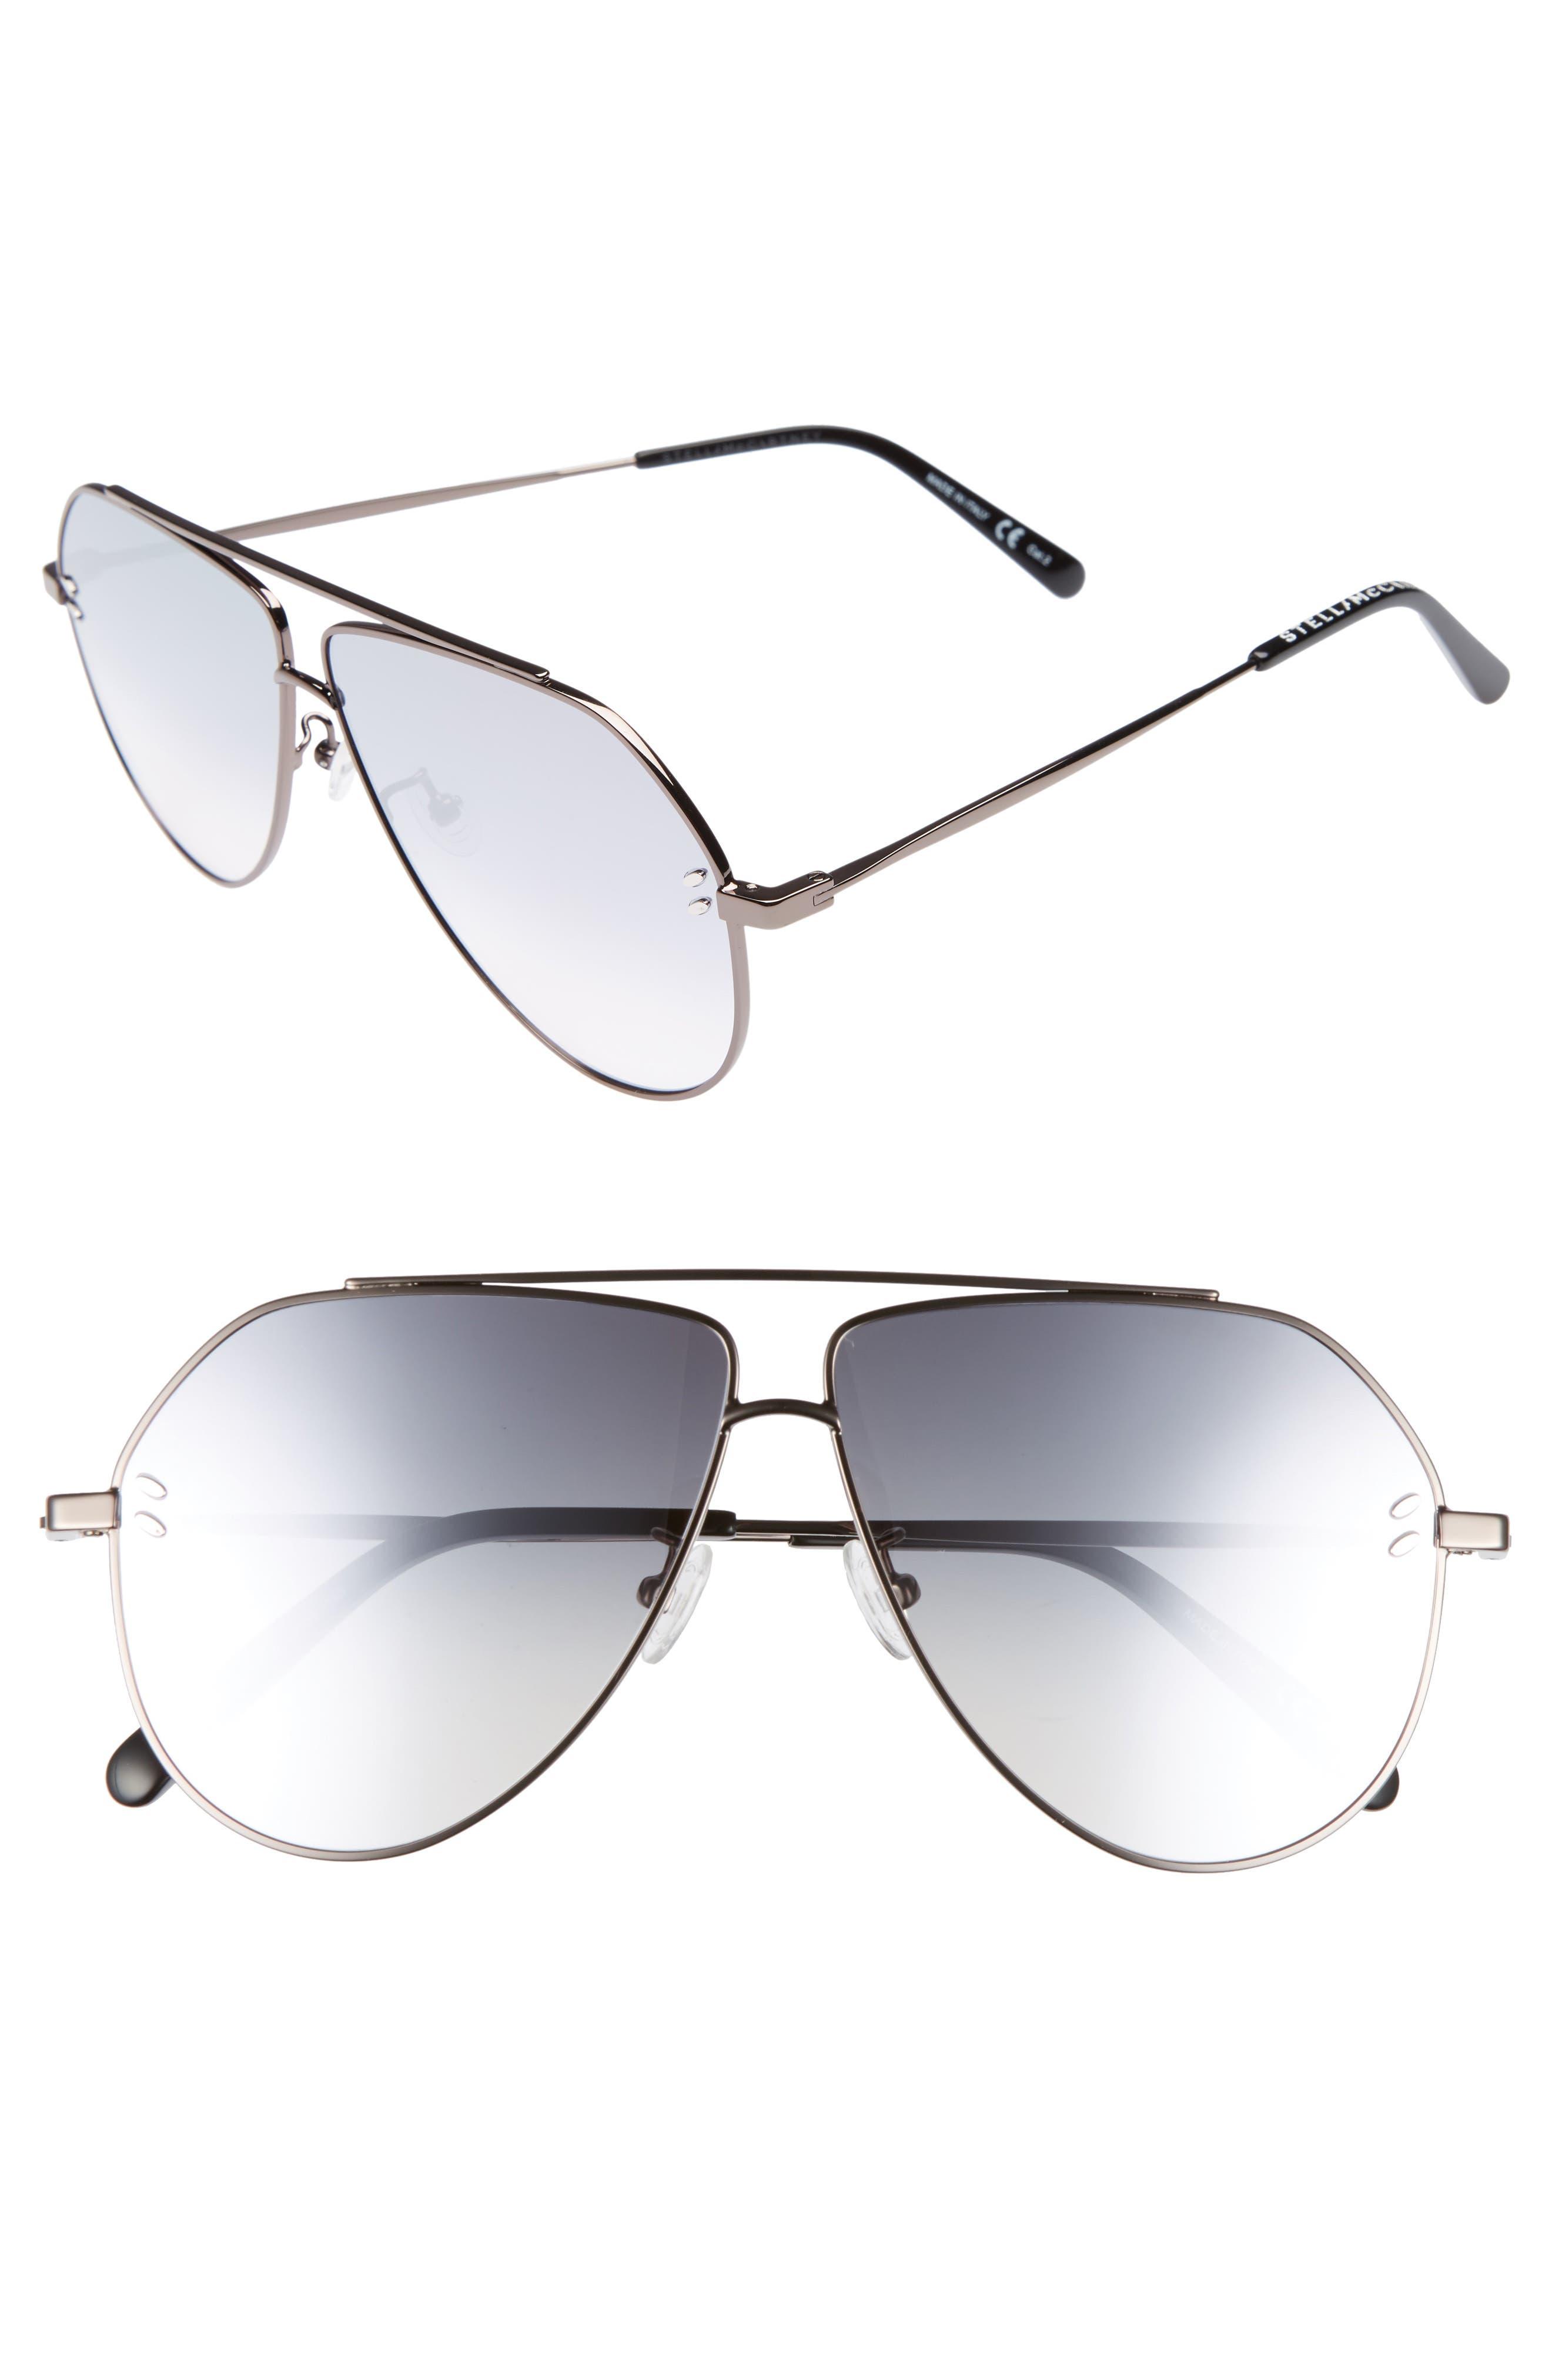 60mm Aviator Sunglasses,                         Main,                         color, Ruthenium